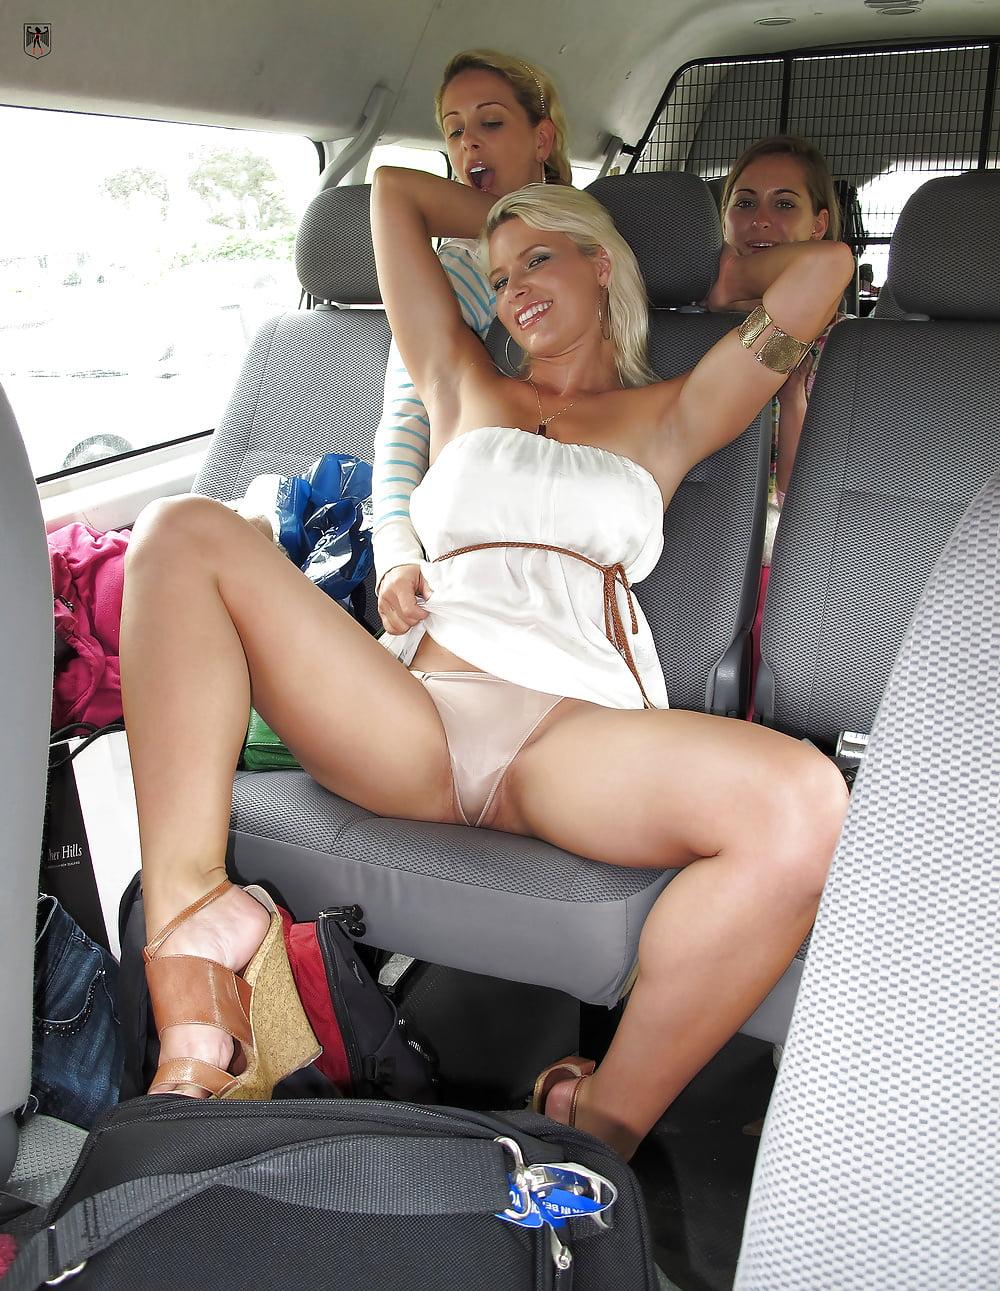 porno-razdvinutie-nogi-v-transporte-foto